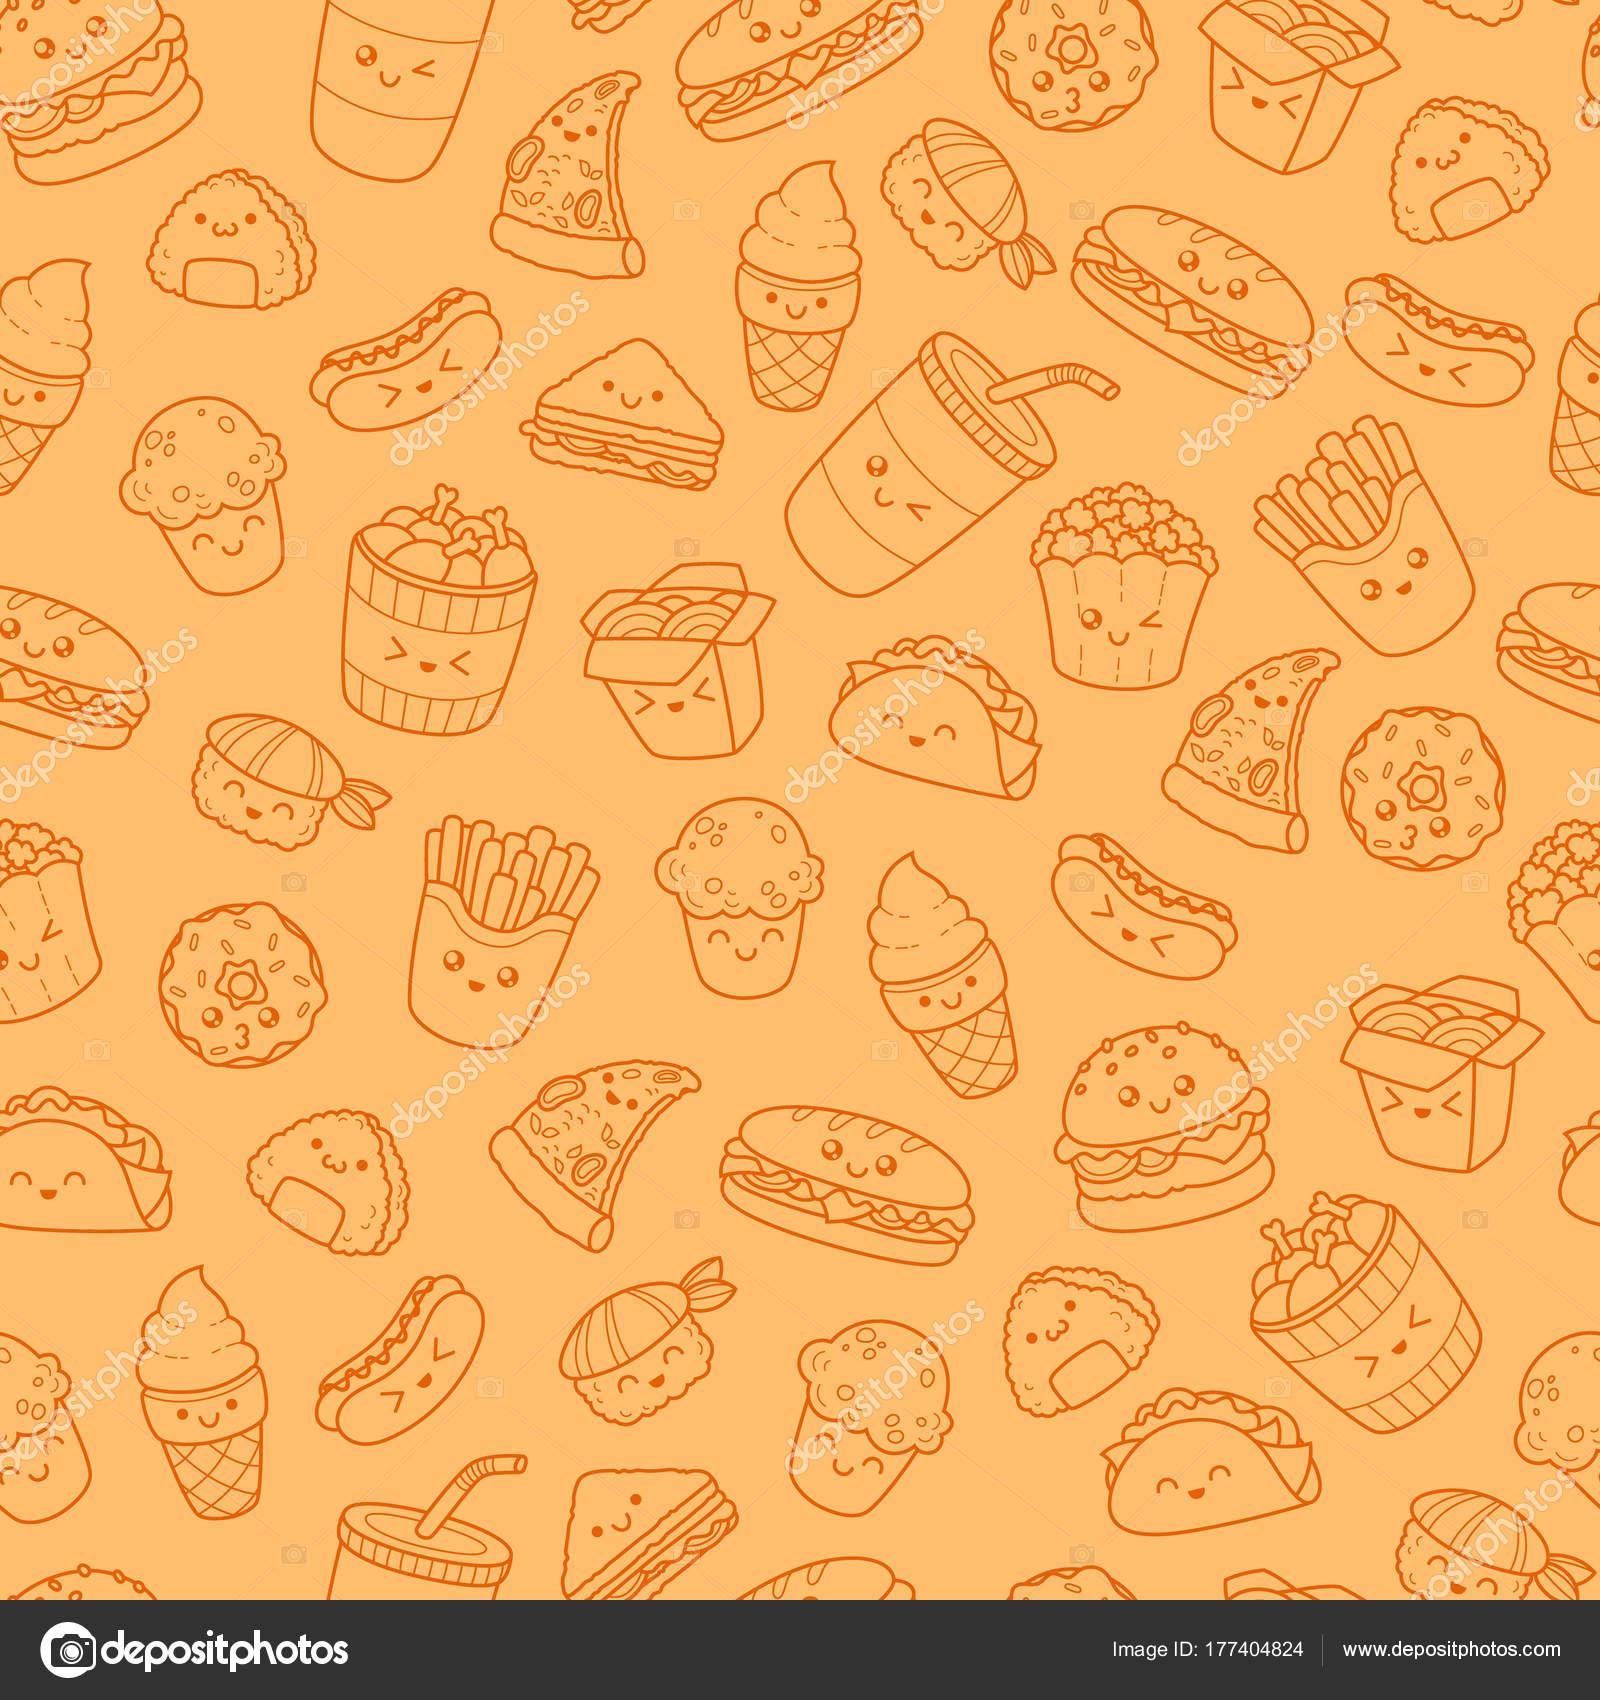 Junk Food Wallpaper   54 Group Wallpapers 1600x1700